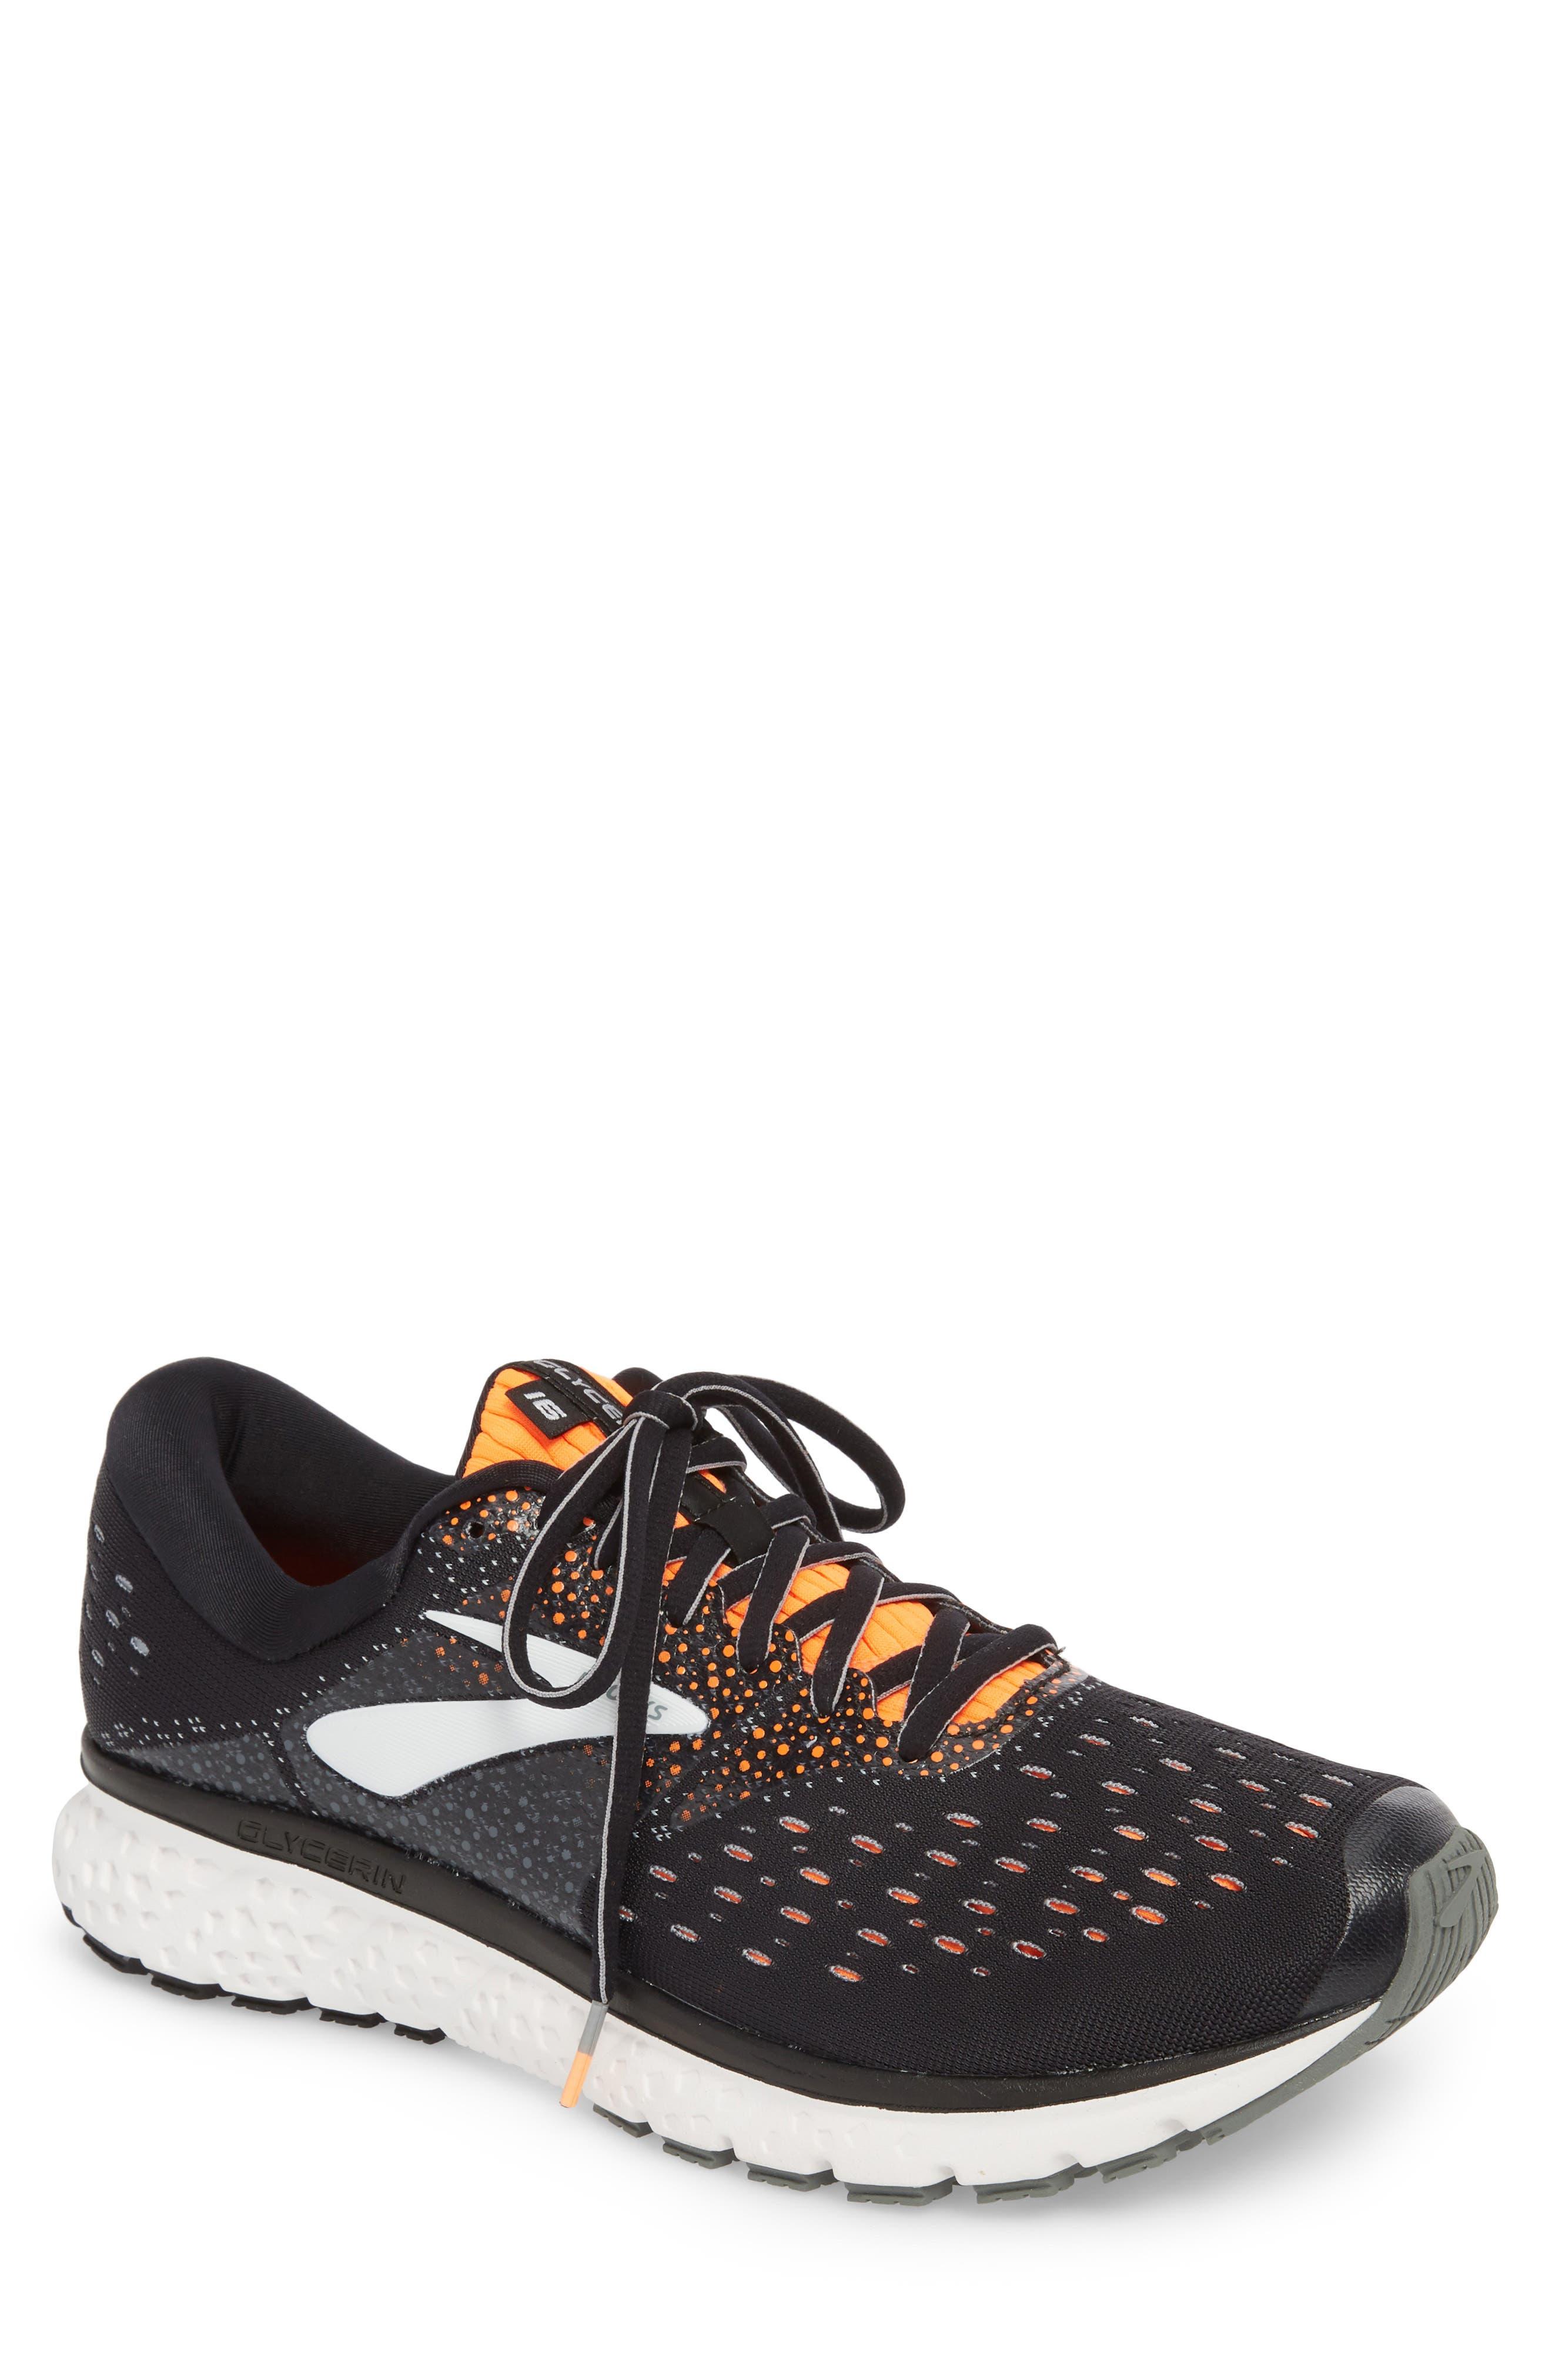 Glycerin 16 Running Shoe,                         Main,                         color, BLACK/ ORANGE/ GREY